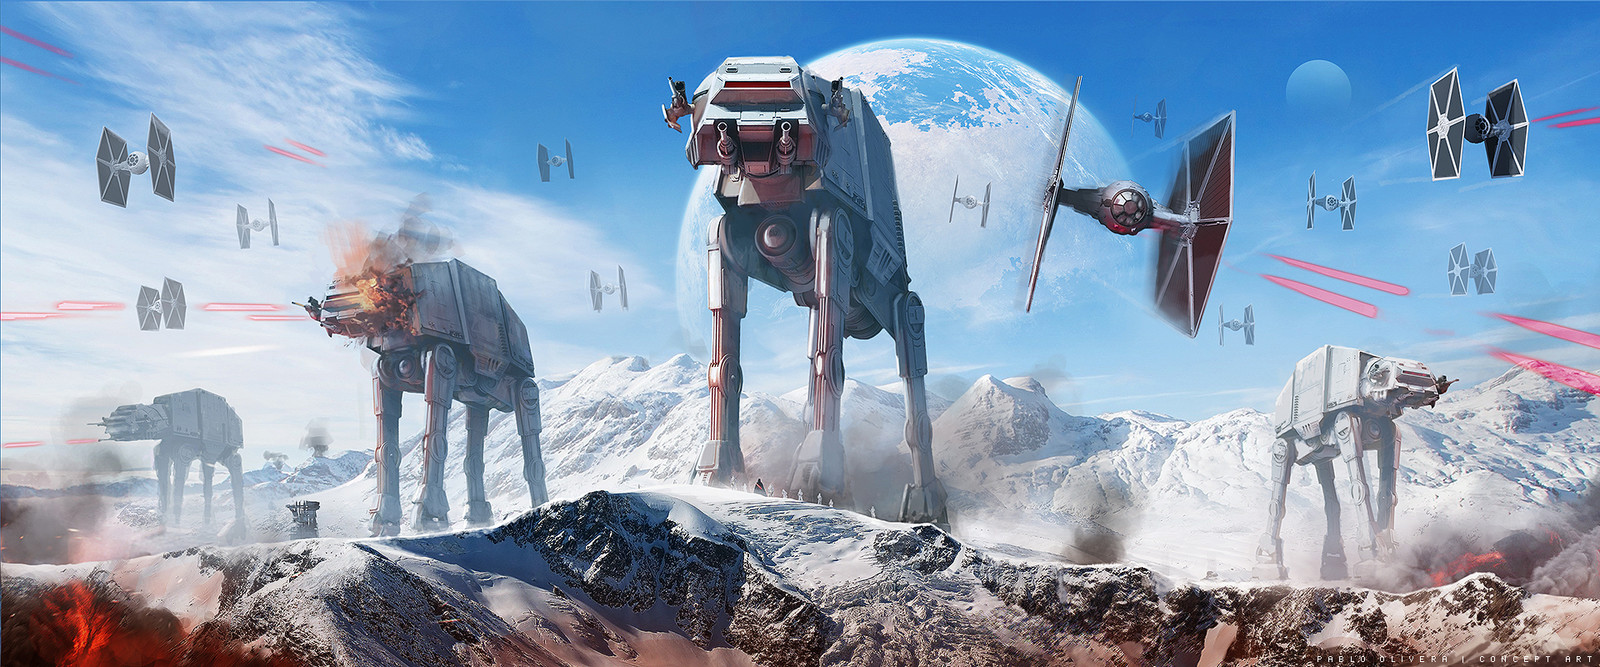 Star Wars, Battle of Hoth